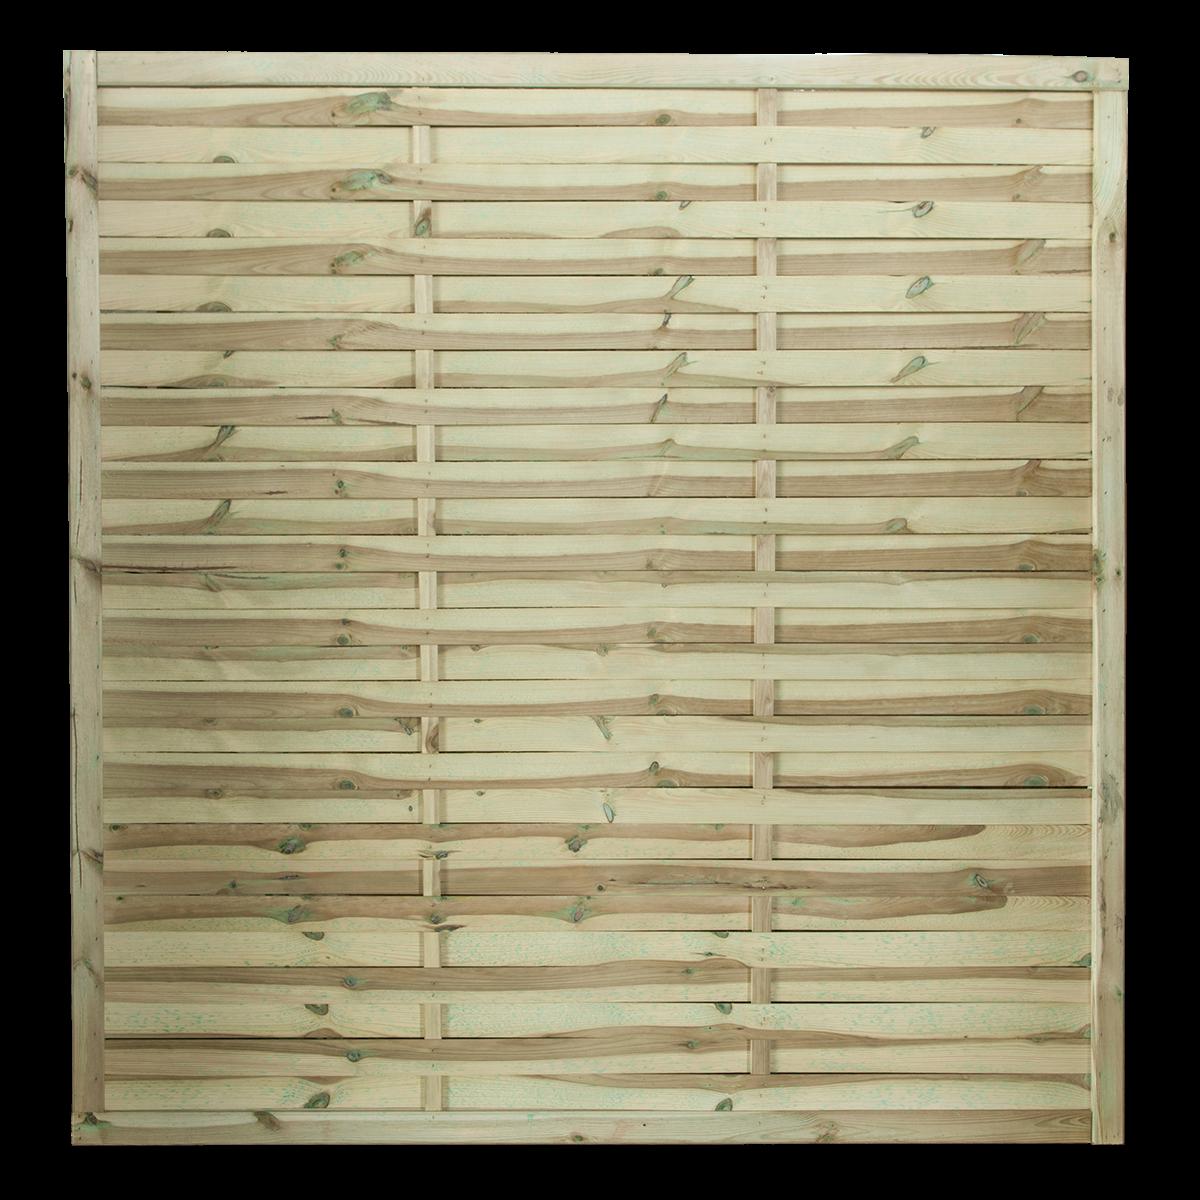 Lamellenzaun 180x180 R35x55 L4 2x60 Stelmet Product Catalogue